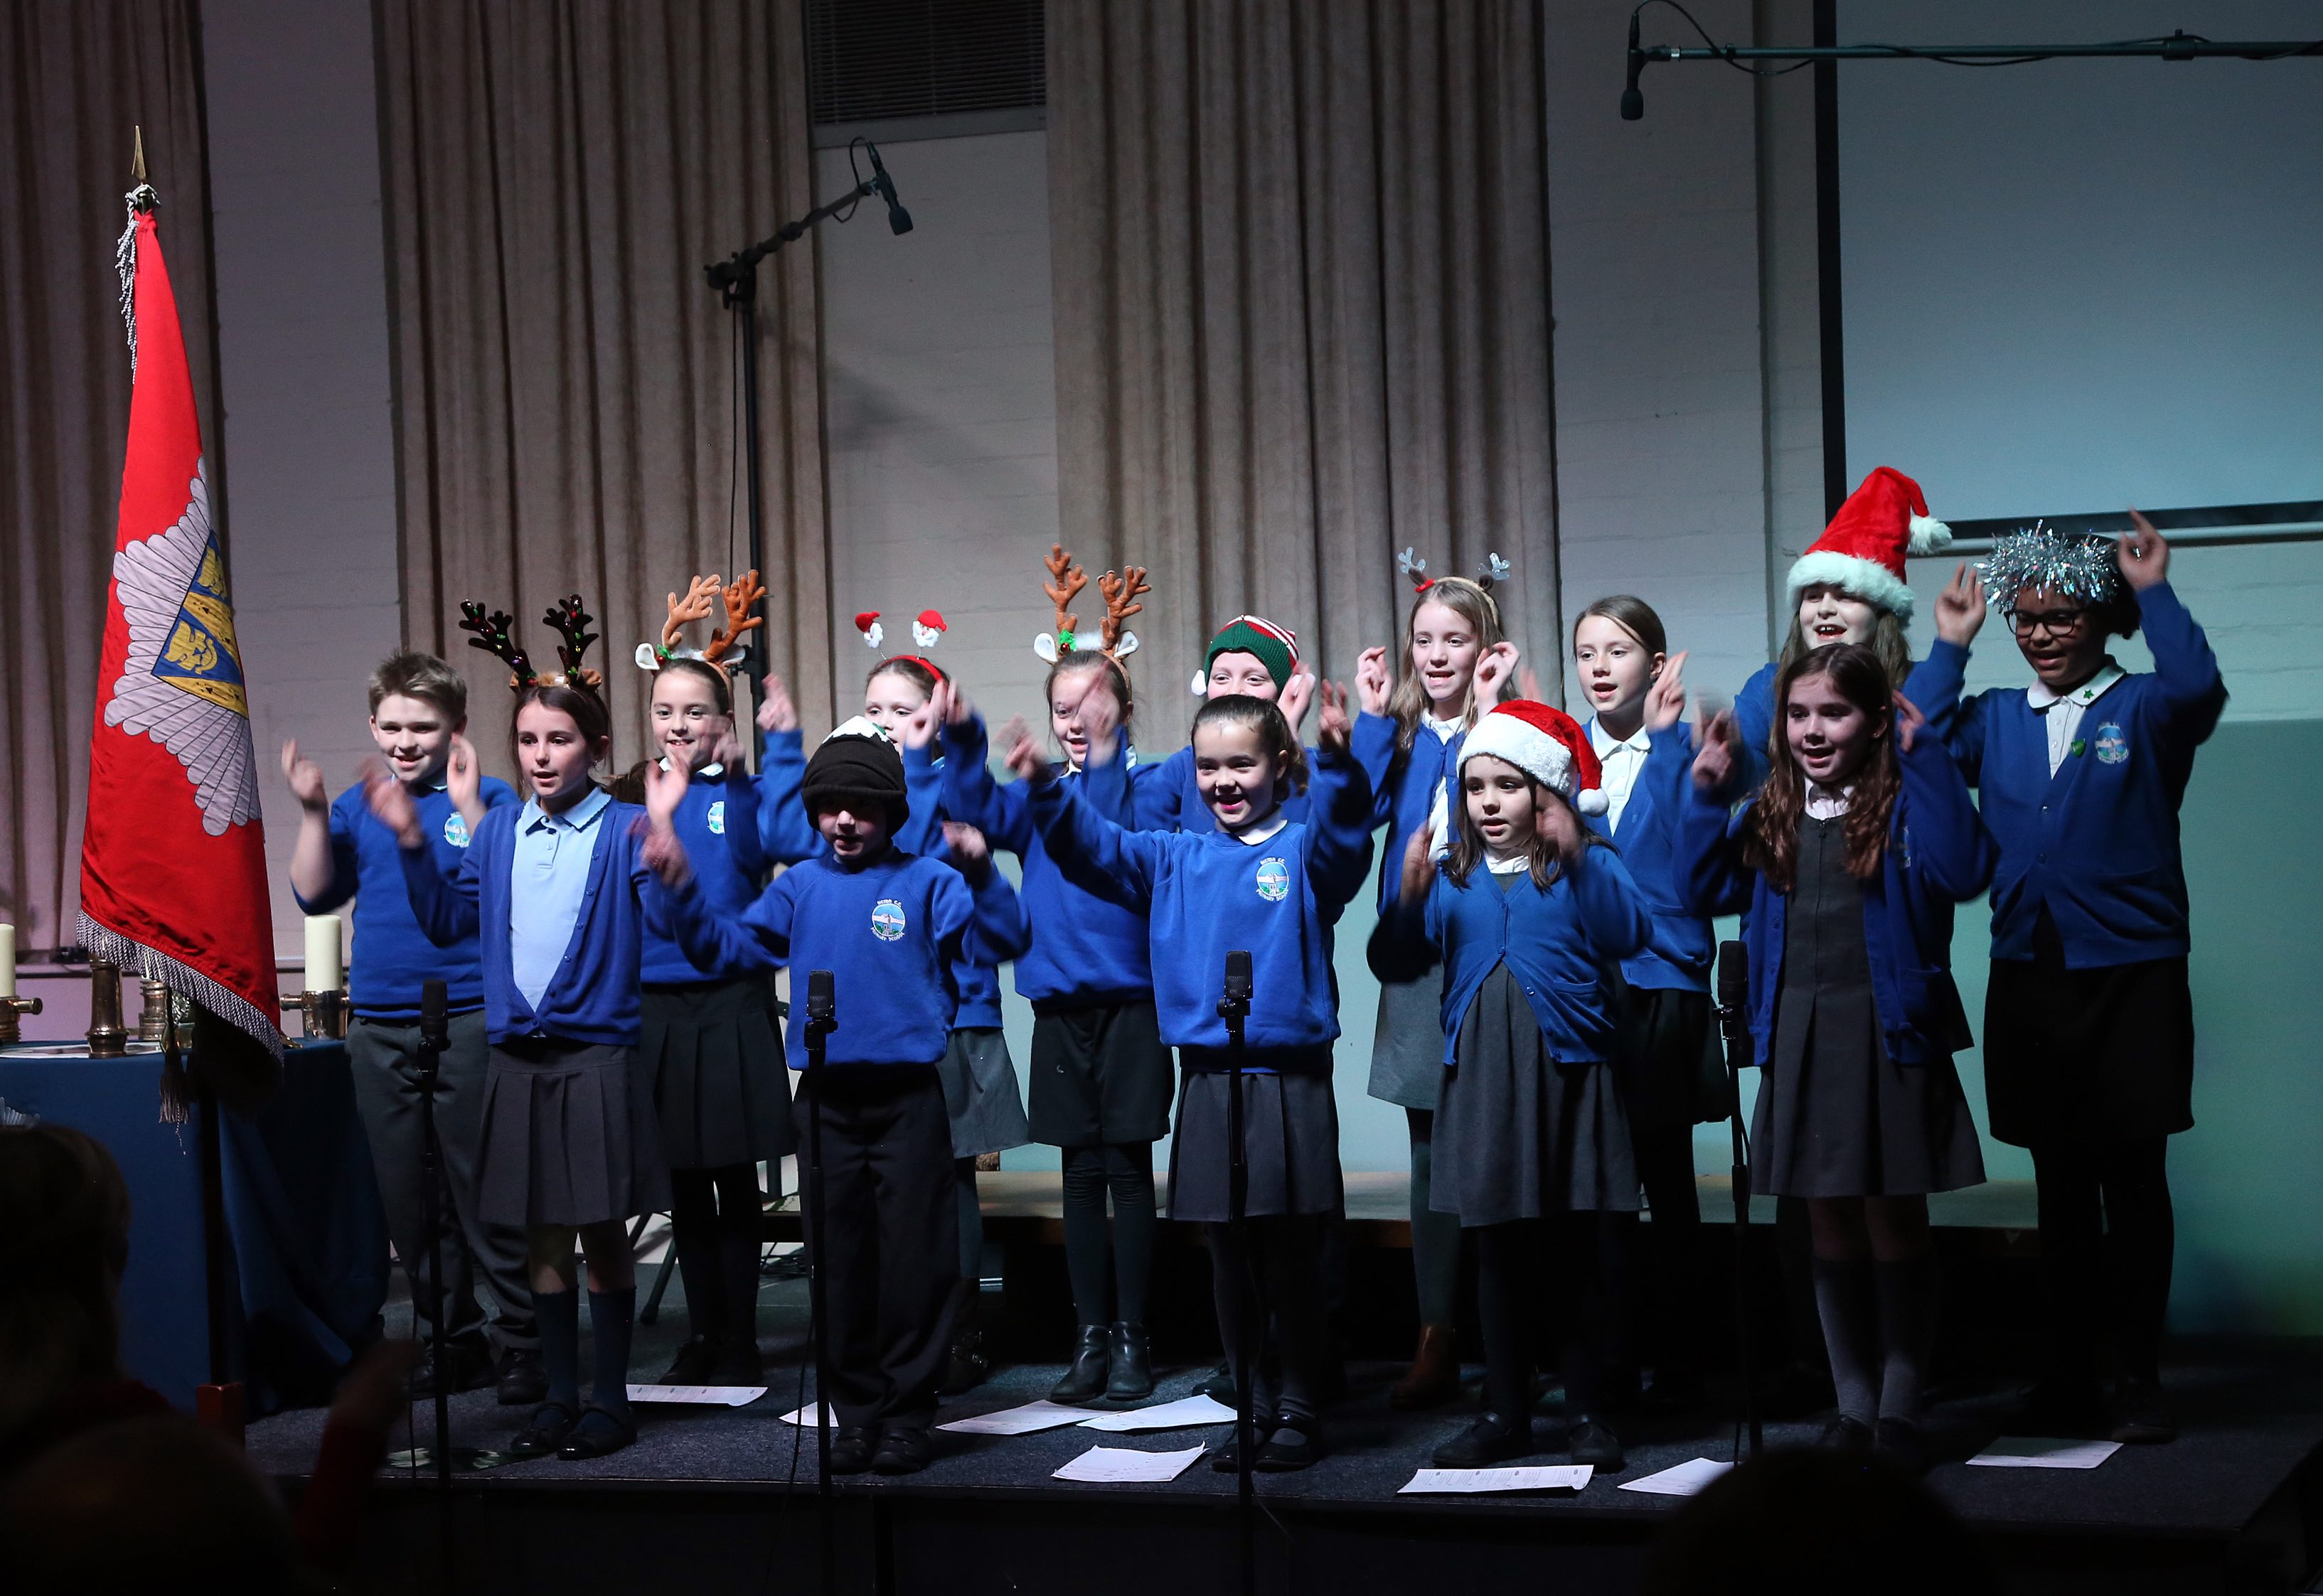 Bicton School Choir